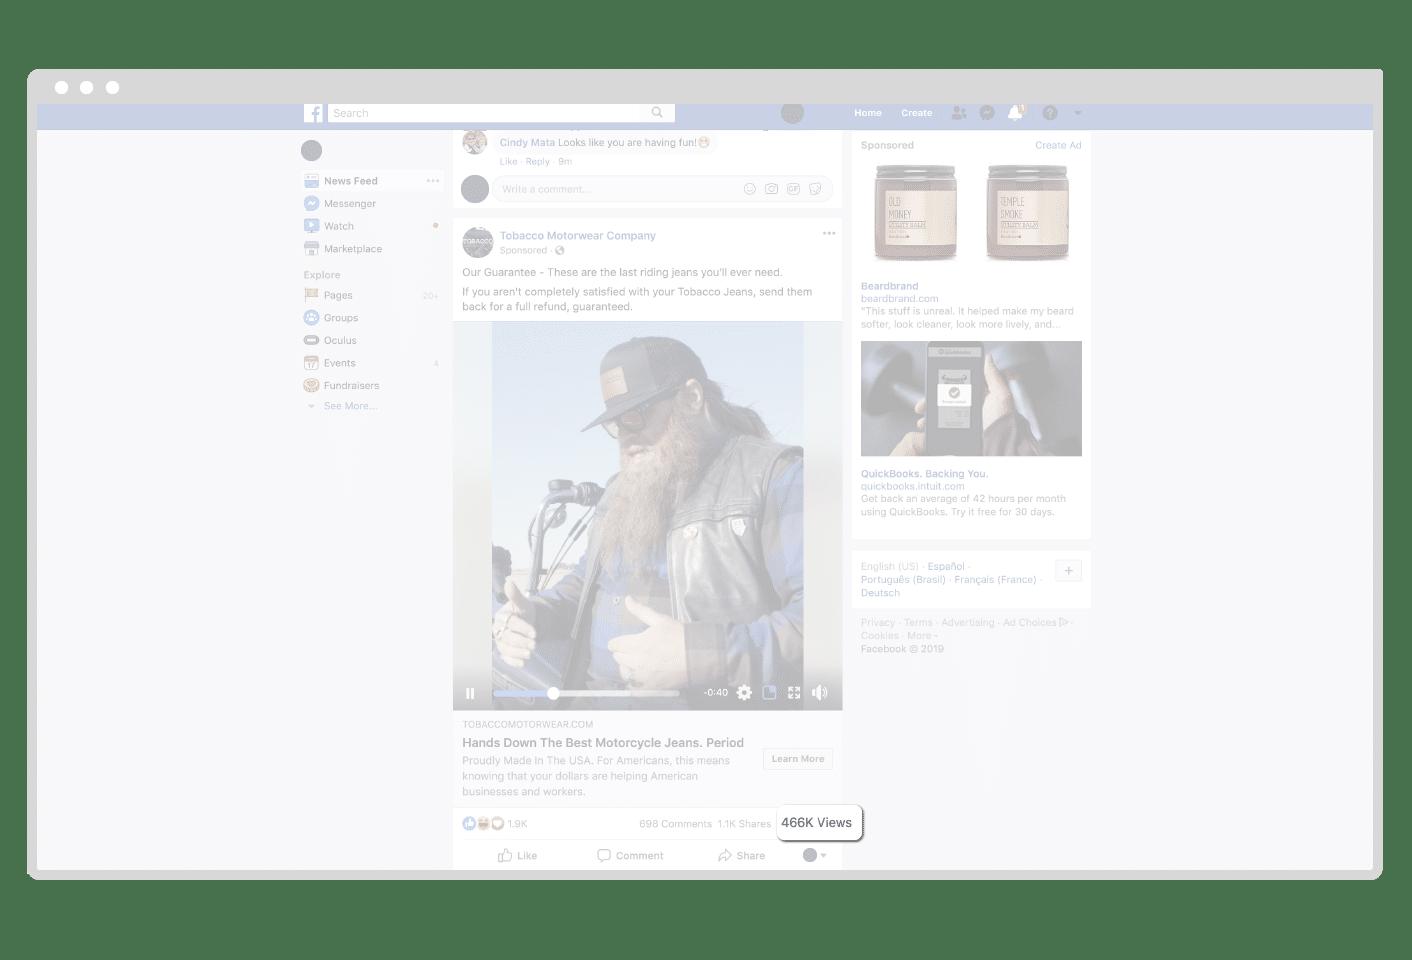 Facebook video public views